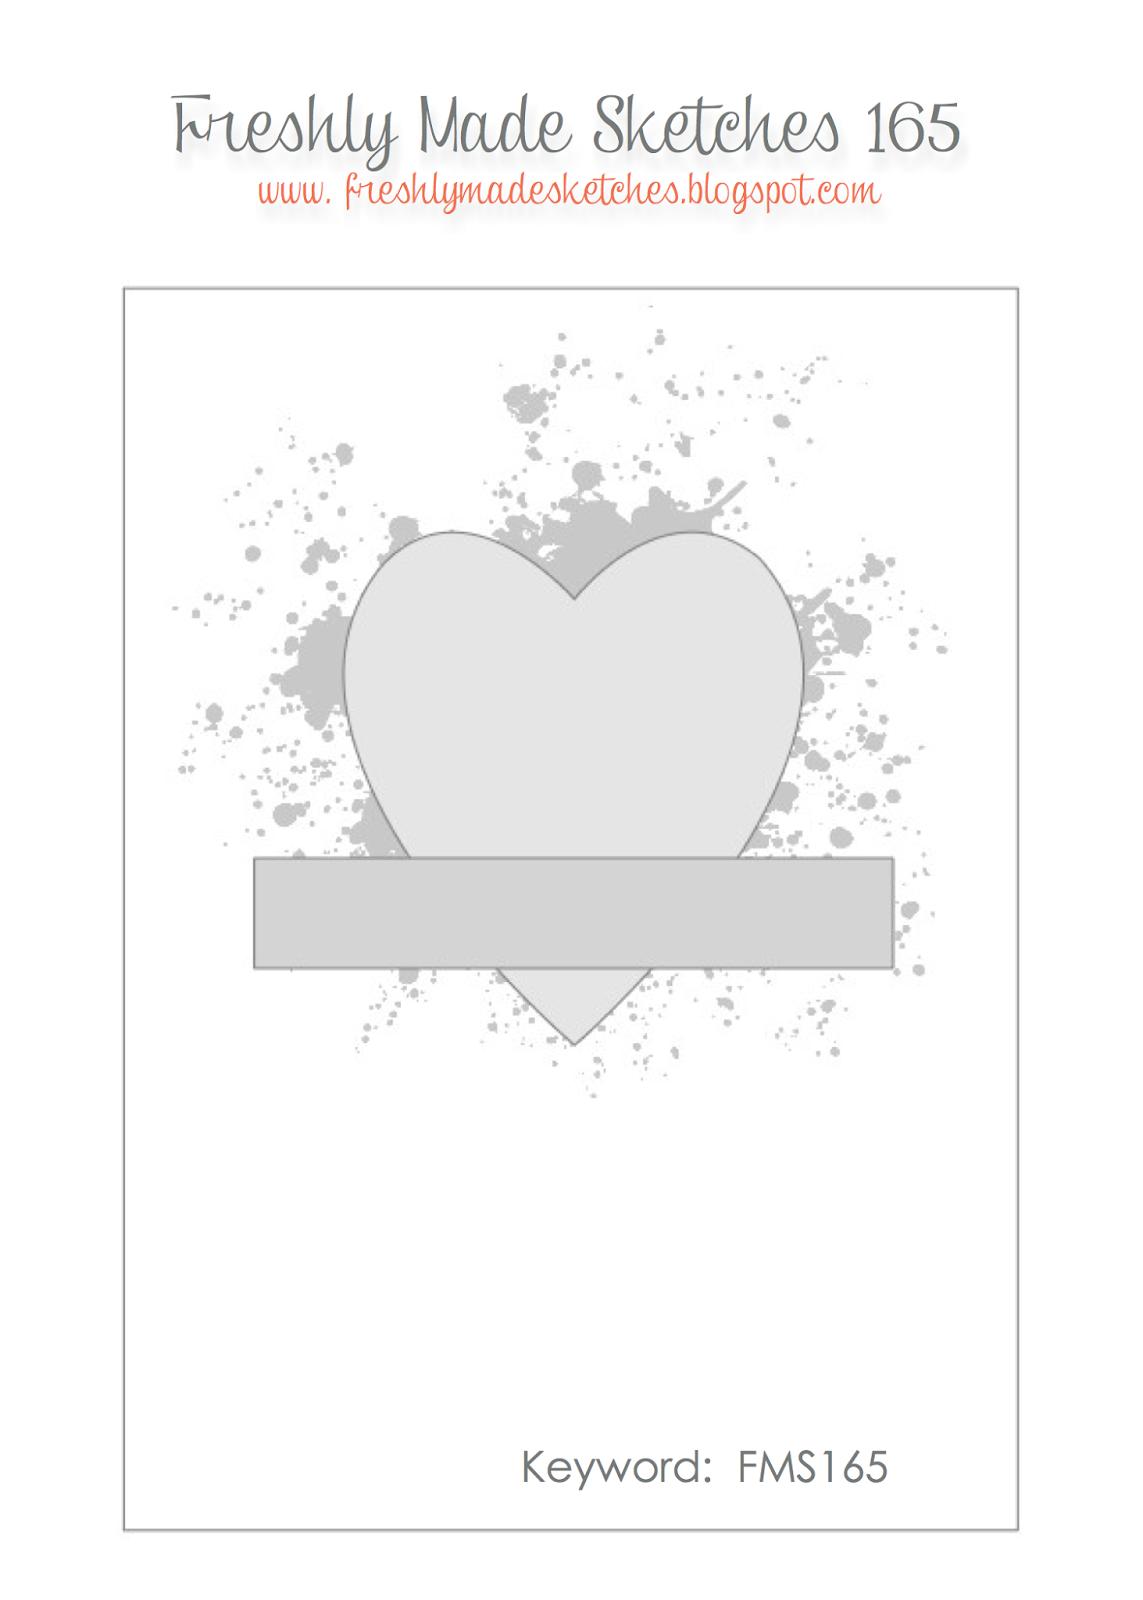 http://freshlymadesketches.blogspot.com/2014/12/freshly-made-sketches-165-sketch-by.html?utm_source=feedburner&utm_medium=email&utm_campaign=Feed%3A+FreshlyMadeSketches+%28Freshly+Made+Sketches%29